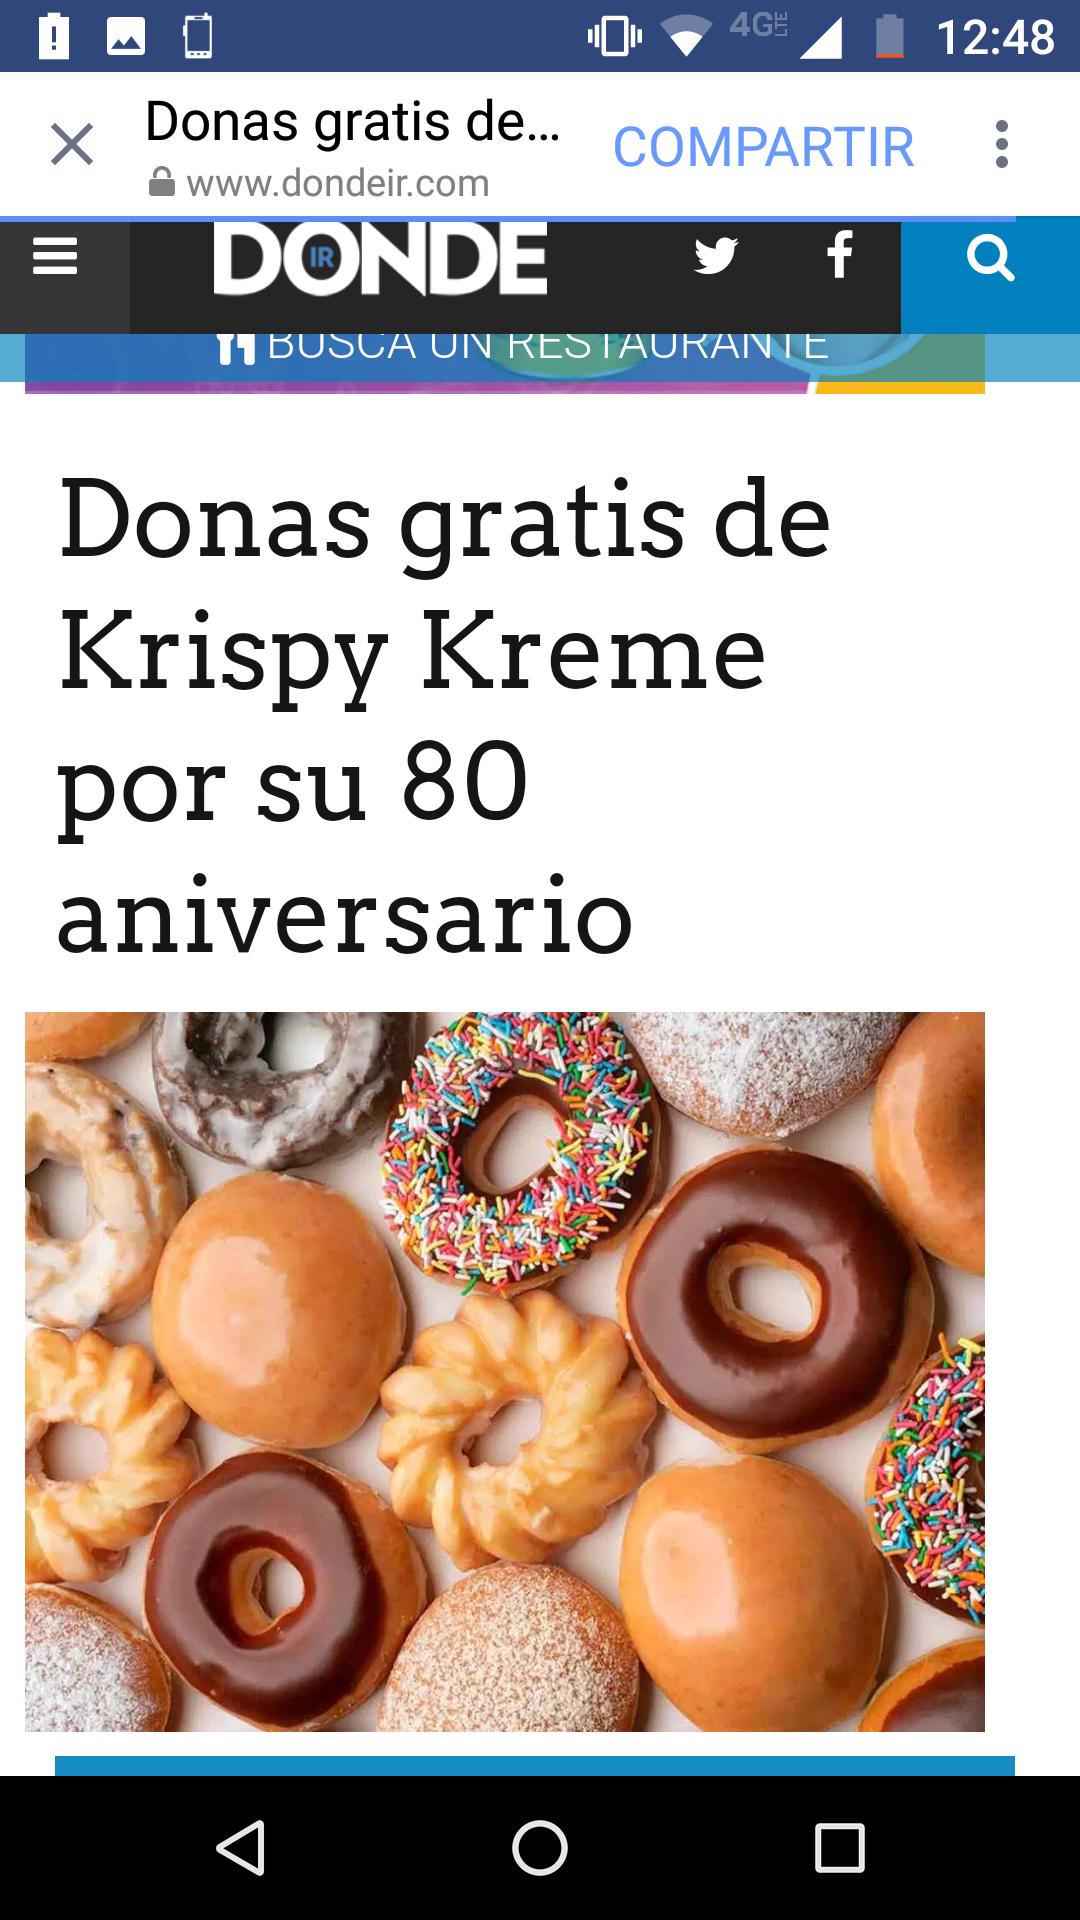 Torre Mayor CDMX: Donas gratis 80 aniversario krispy kreme